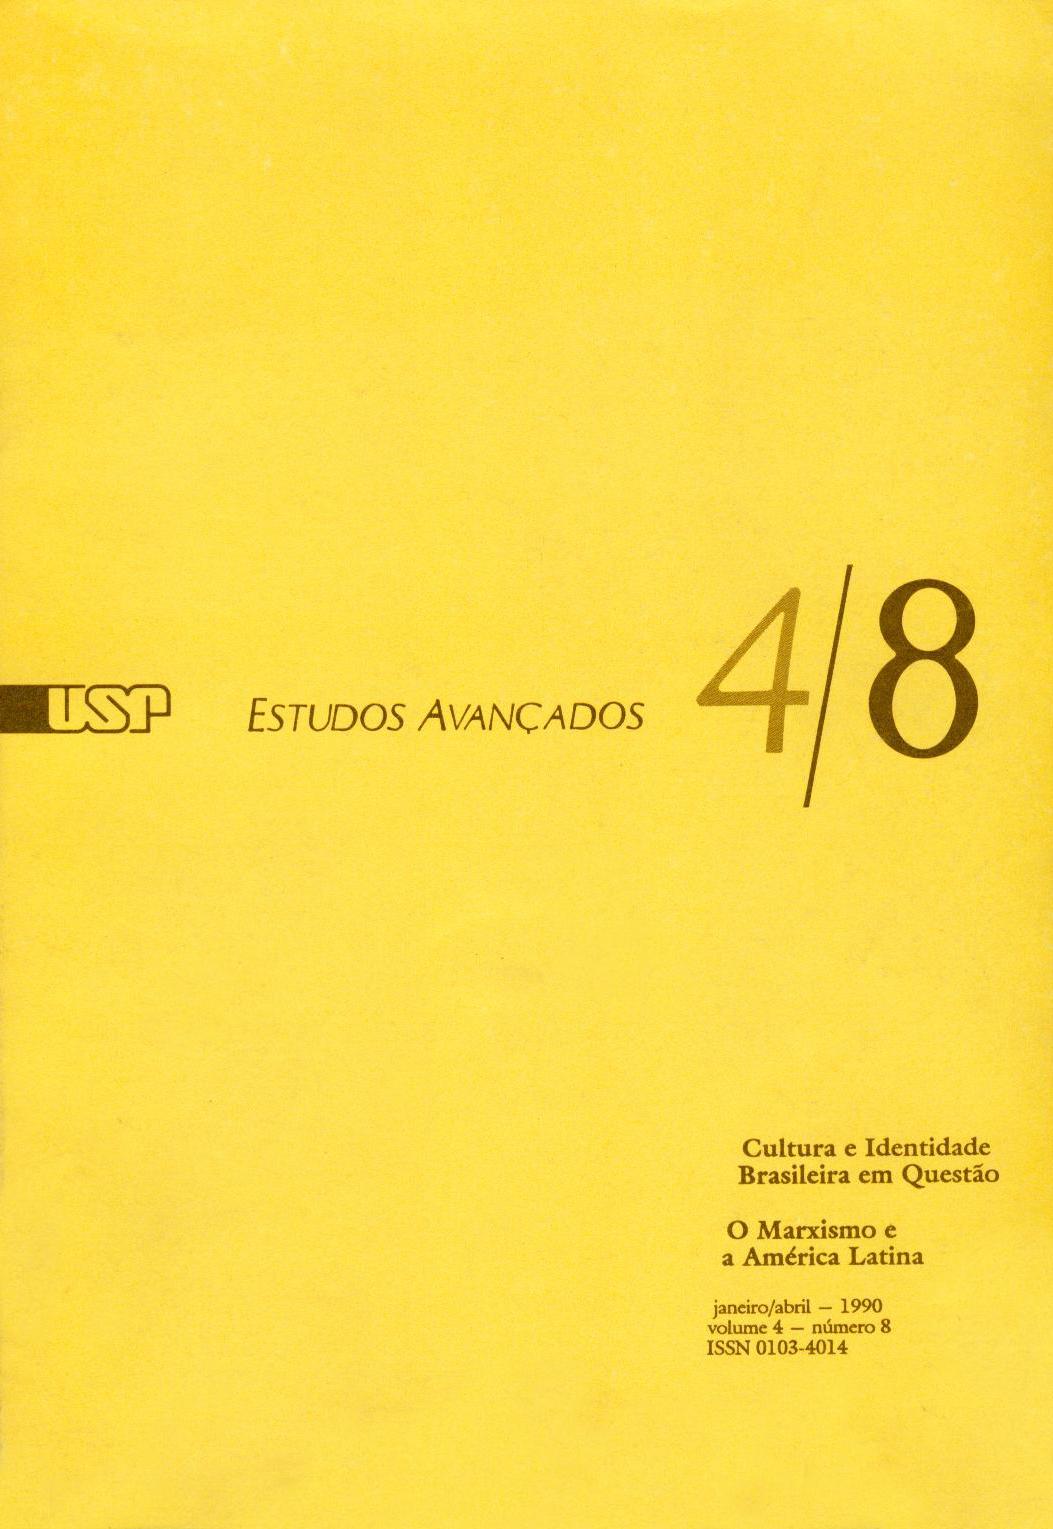 Visualizar v. 4 n. 8 (1990)